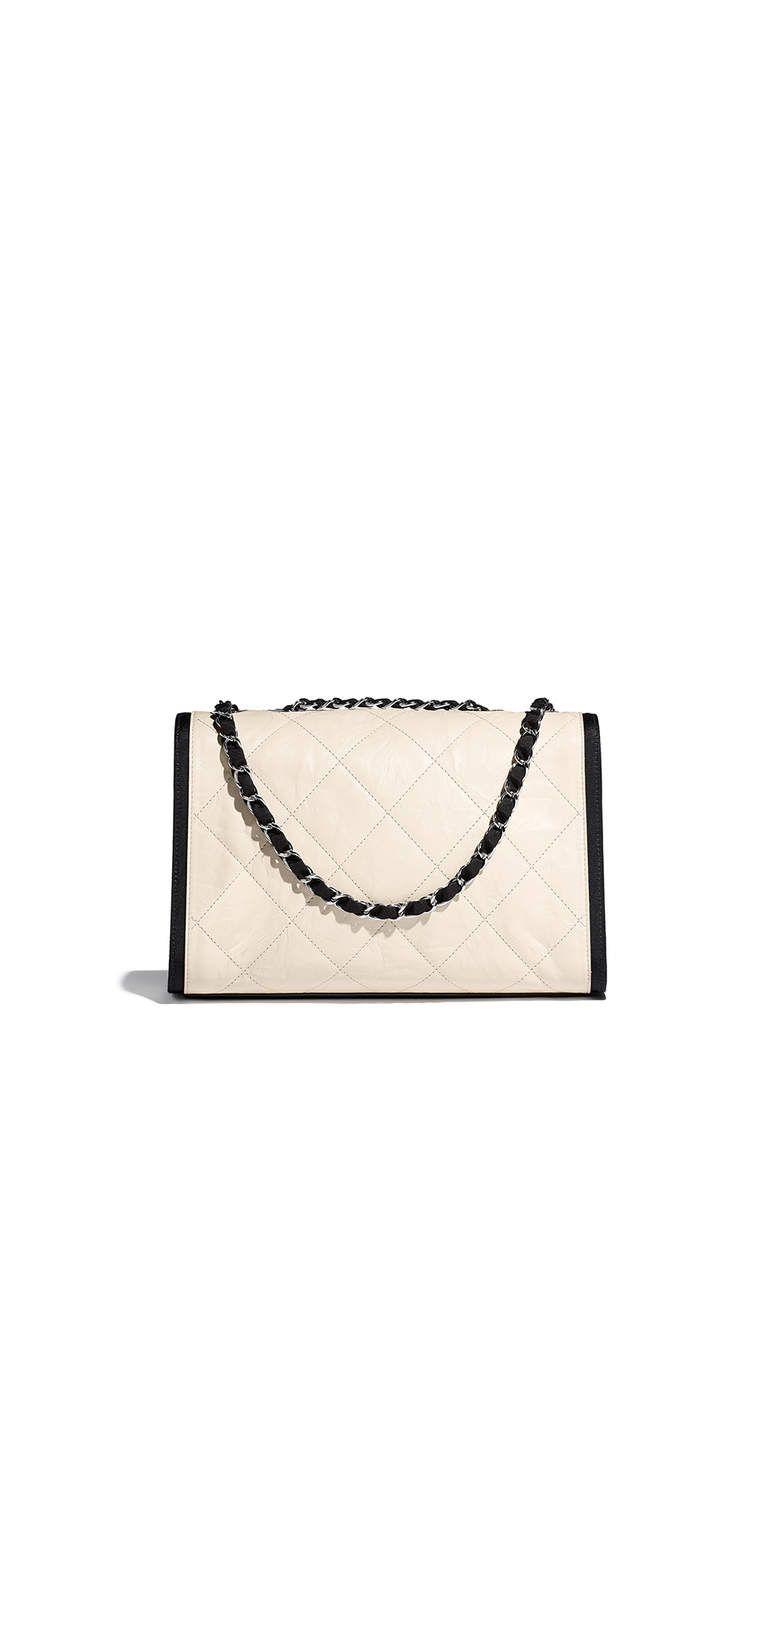 72b0411cccb81e Flap bag, grained crumpled calfskin & silver-tone metal-ivory & black -  CHANEL